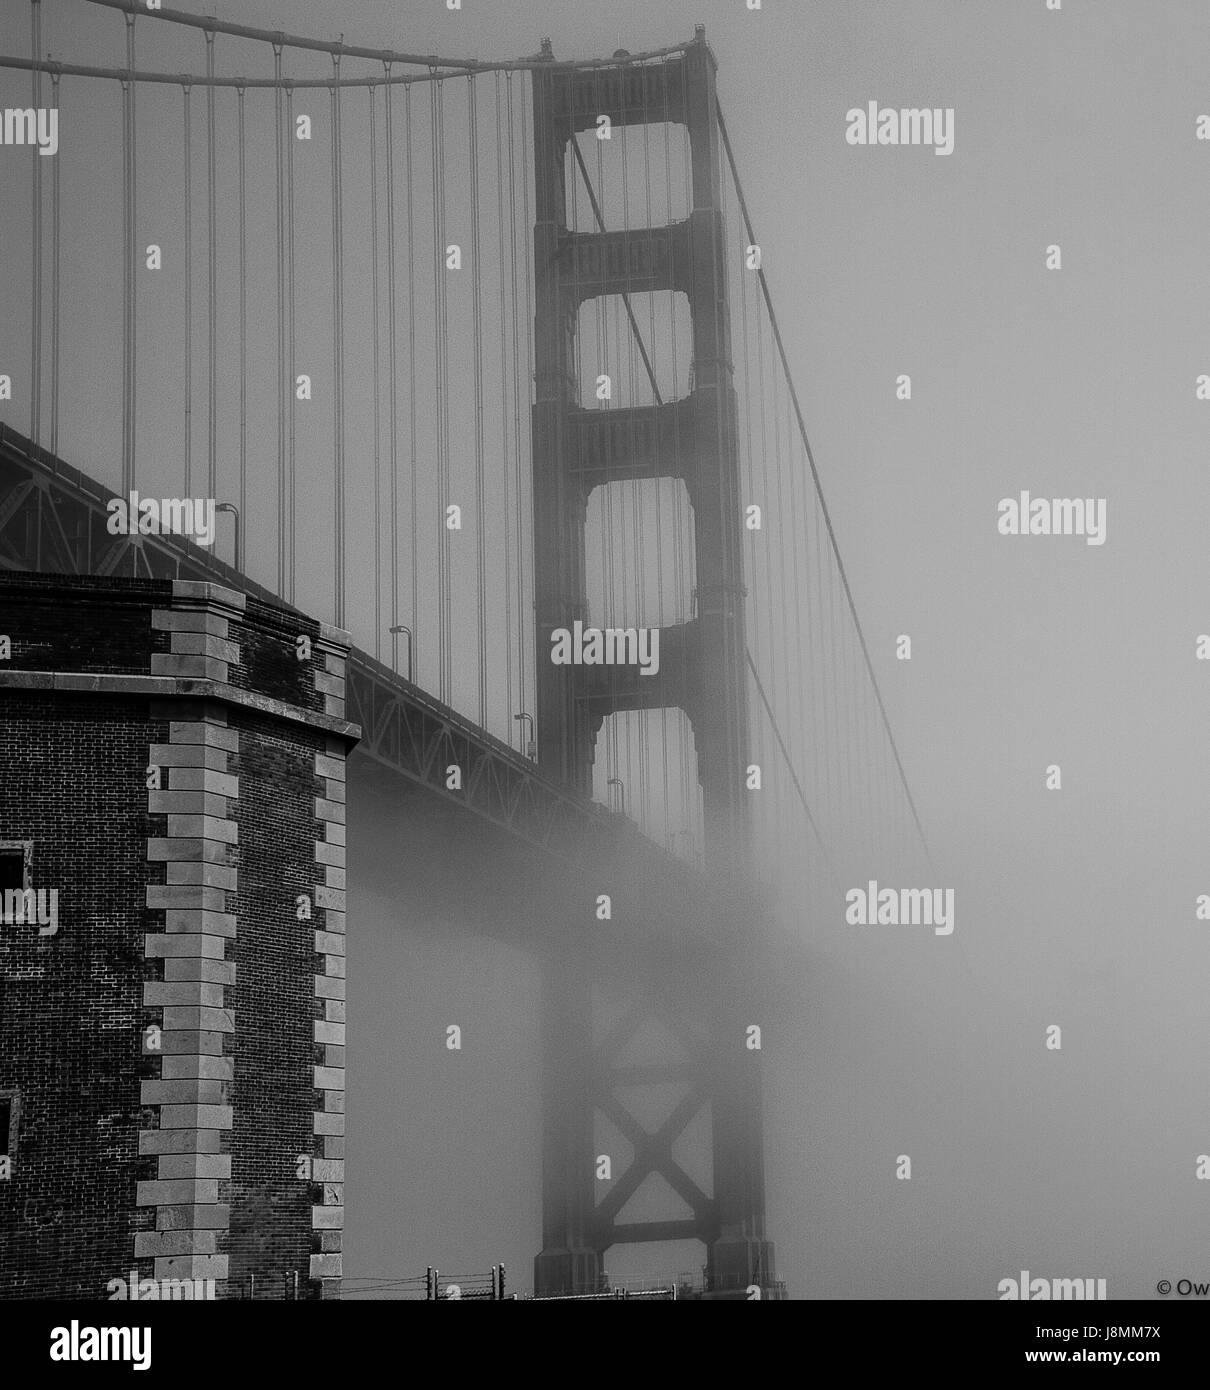 Golden Gate Bridge - San Francisco, Kalifornien Stockbild